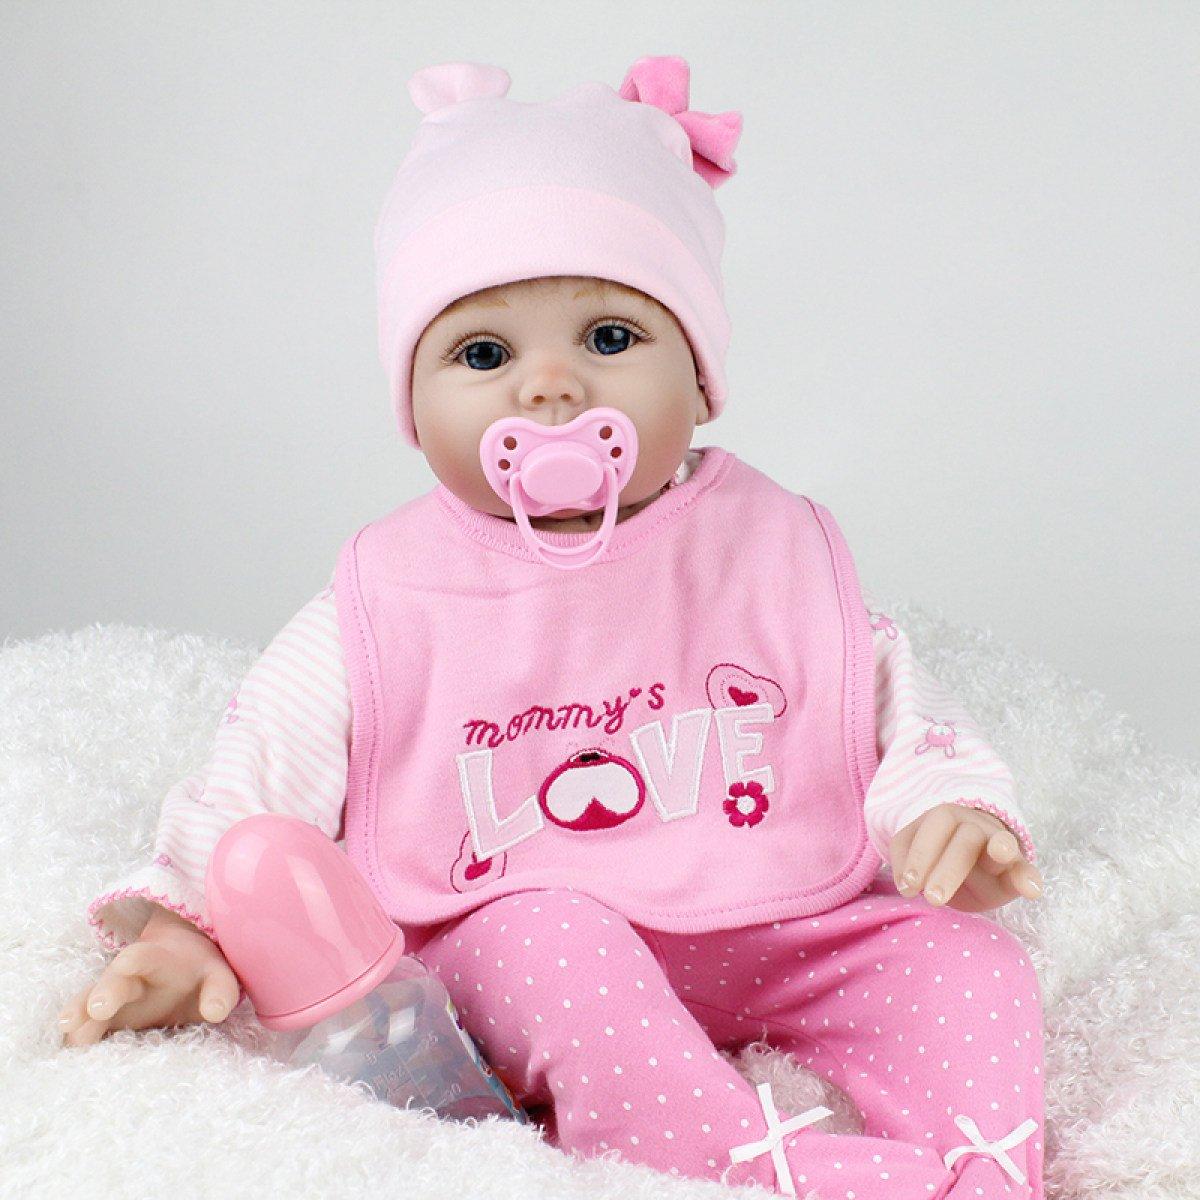 Yihang Rebornベビー人形Realisticハンドメイド新生児シリコンベビー人形LifelikeソフトシミュレーションEyes Open Girlお気に入りプレゼント   B07BP4139N